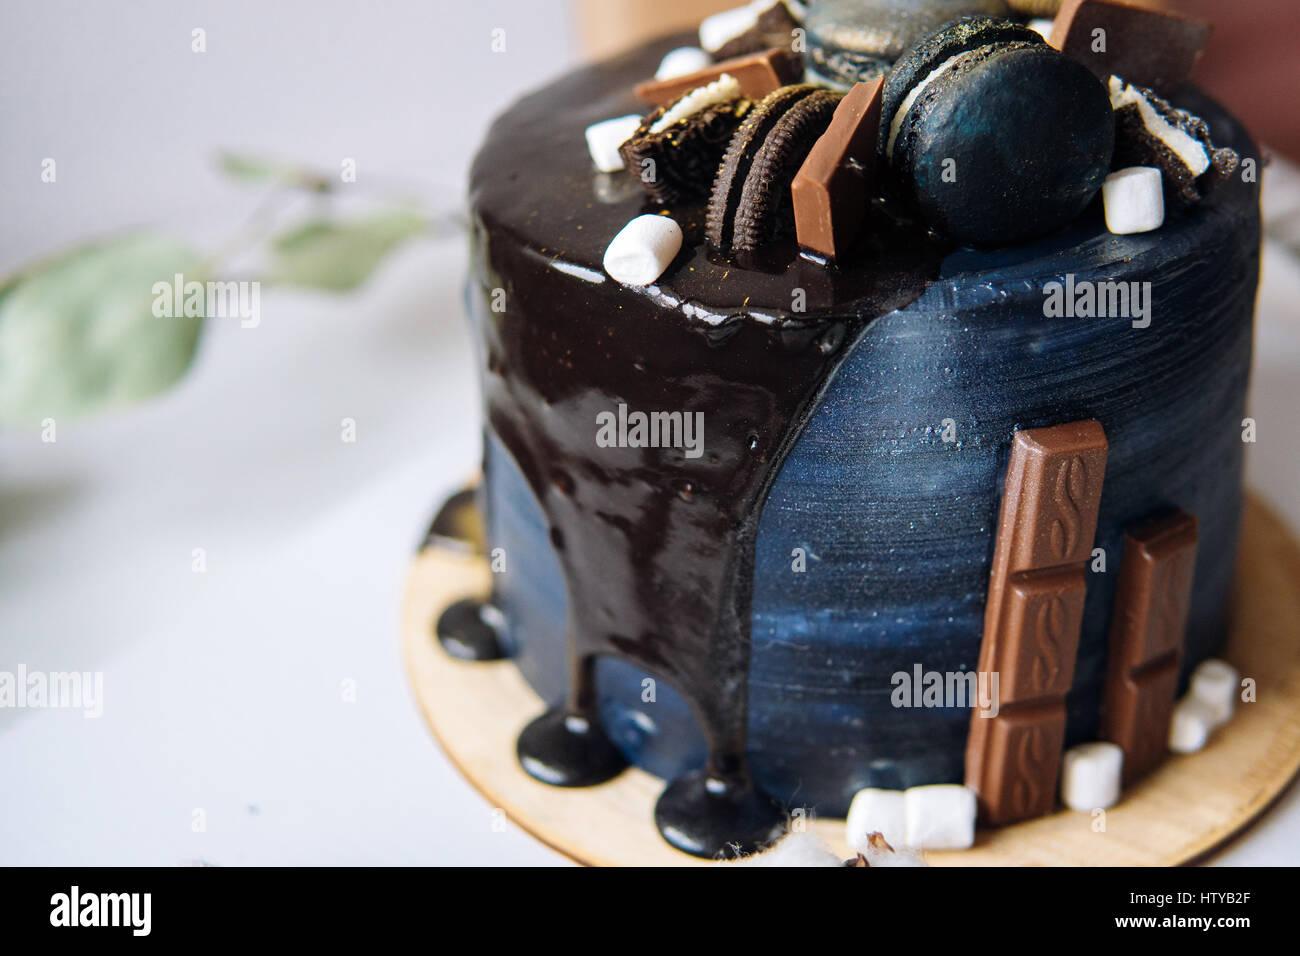 Schone Designer Schokolade Kuchen Stockfoto Bild 135825719 Alamy